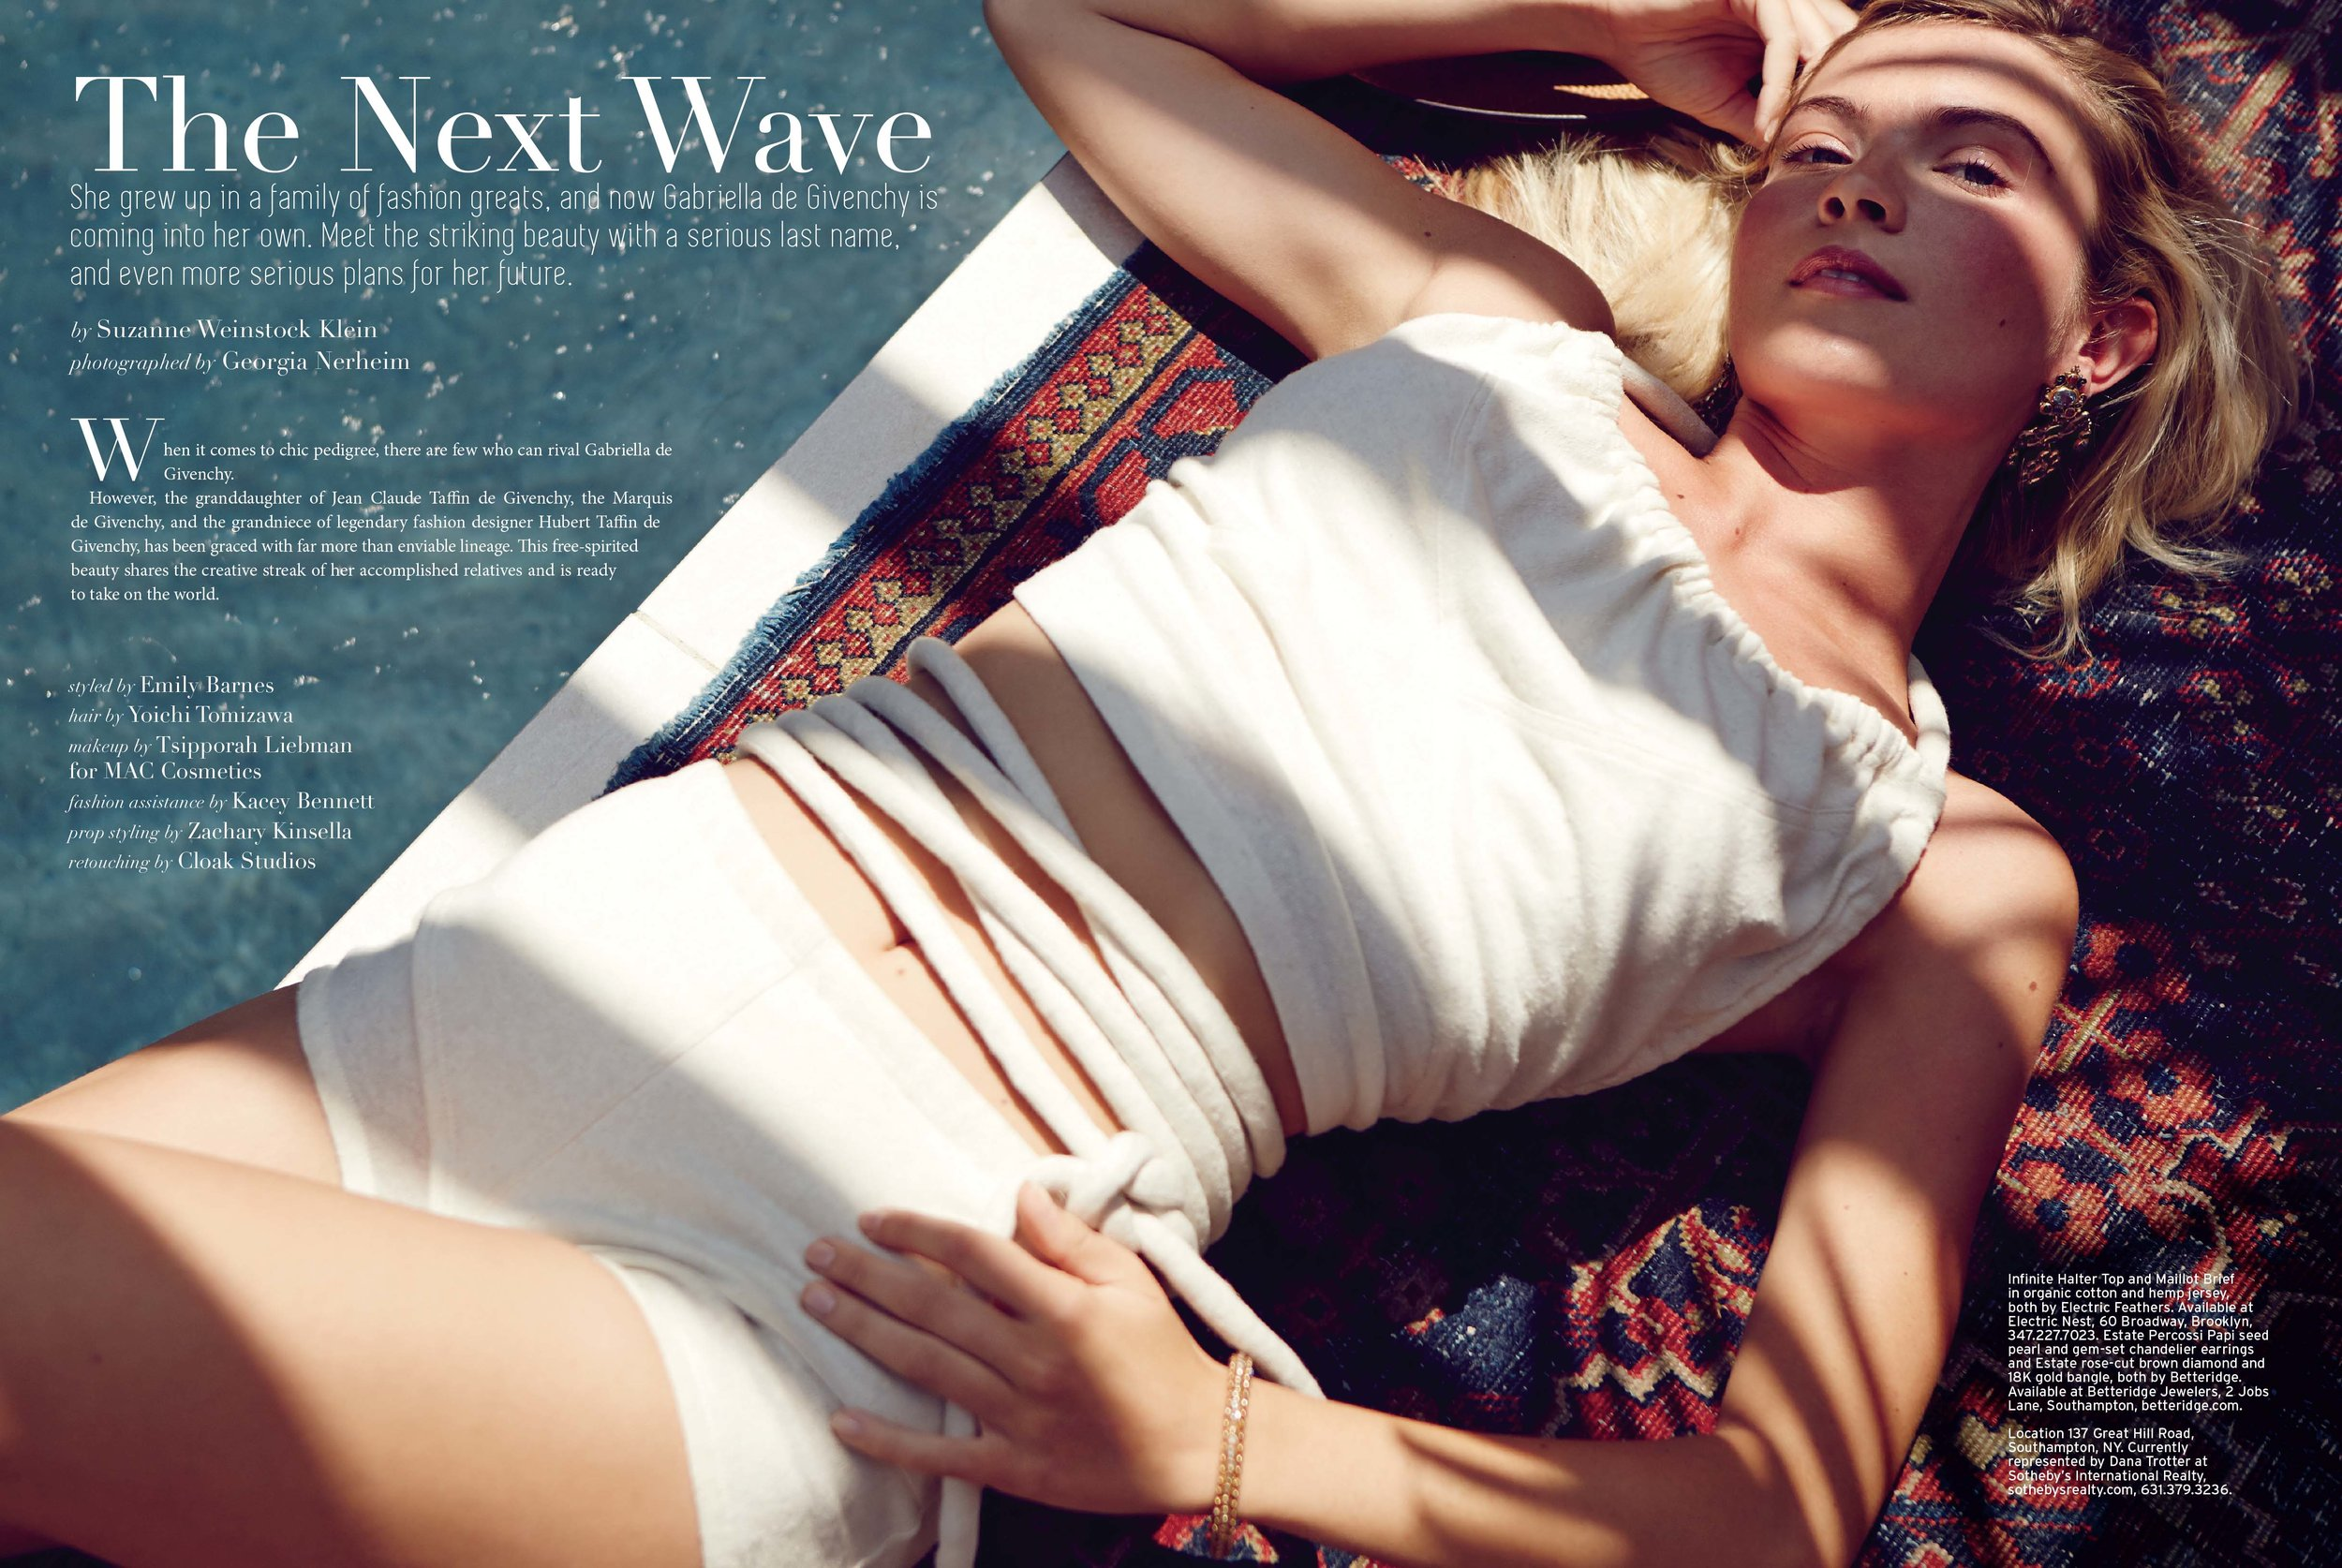 Gabriella de Givenchy-1.jpg